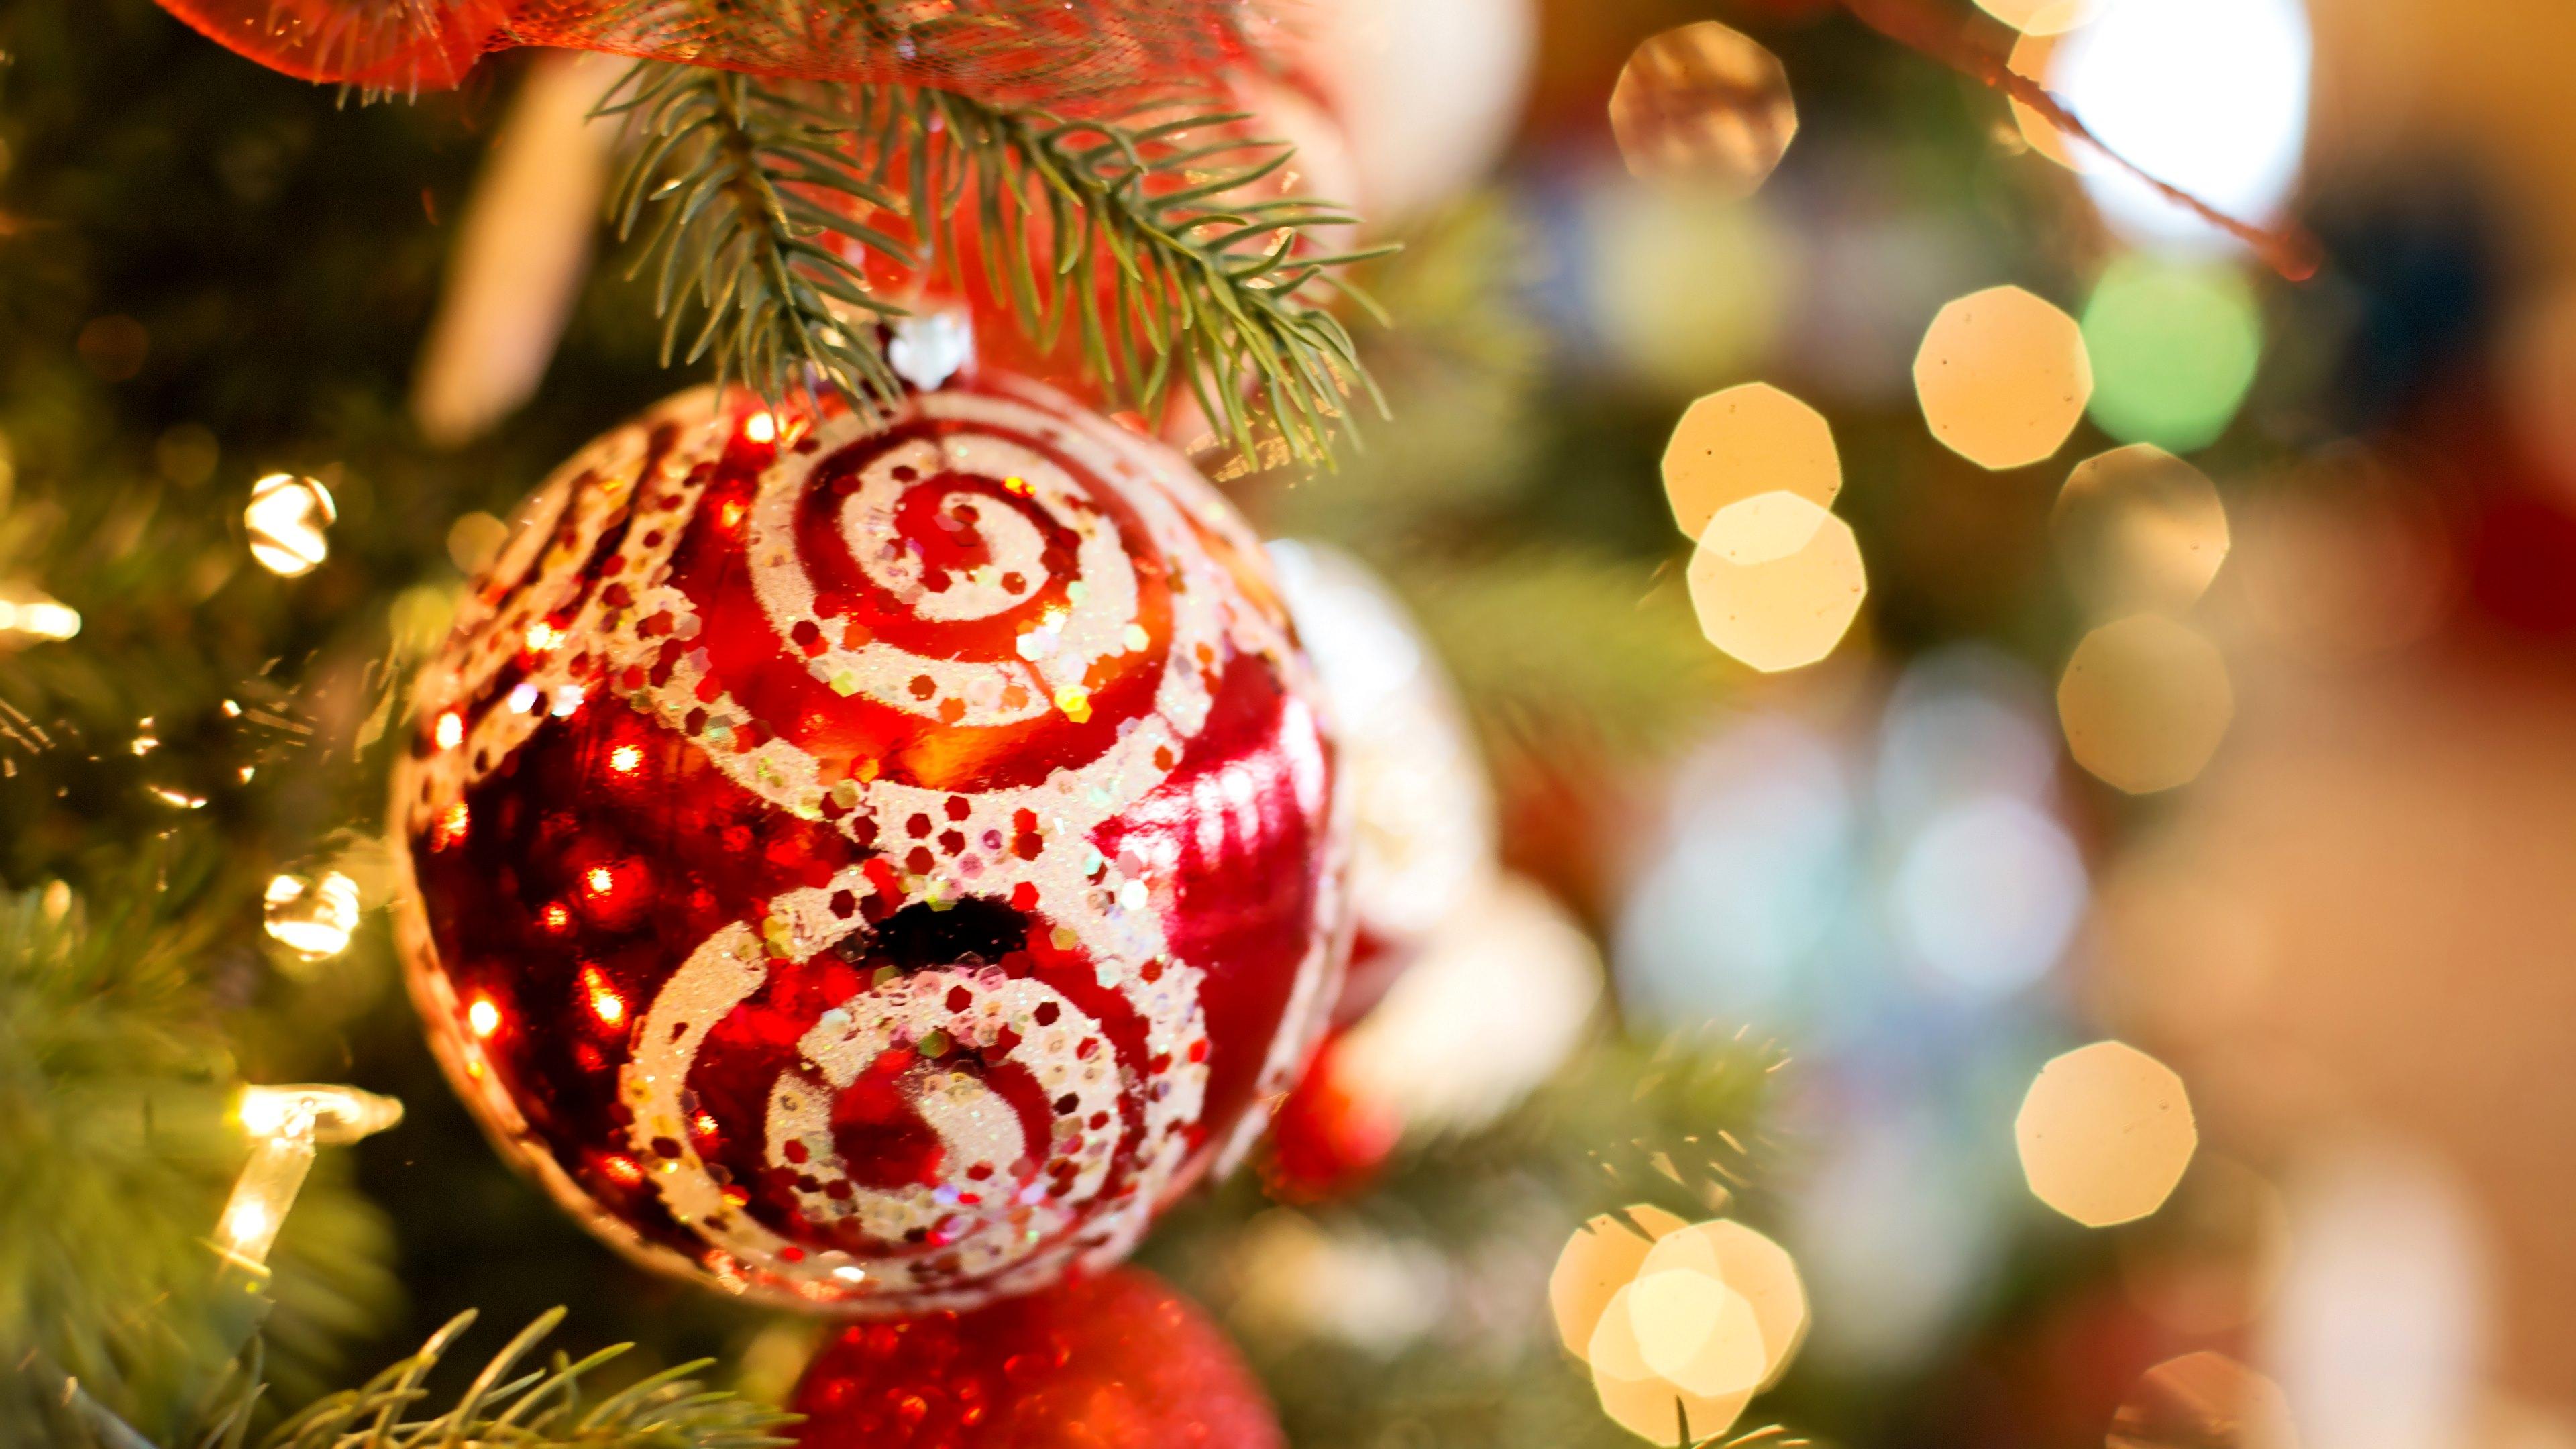 Hd wallpaper xmas - Wallpaper Christmas Ornament Xmas Lights